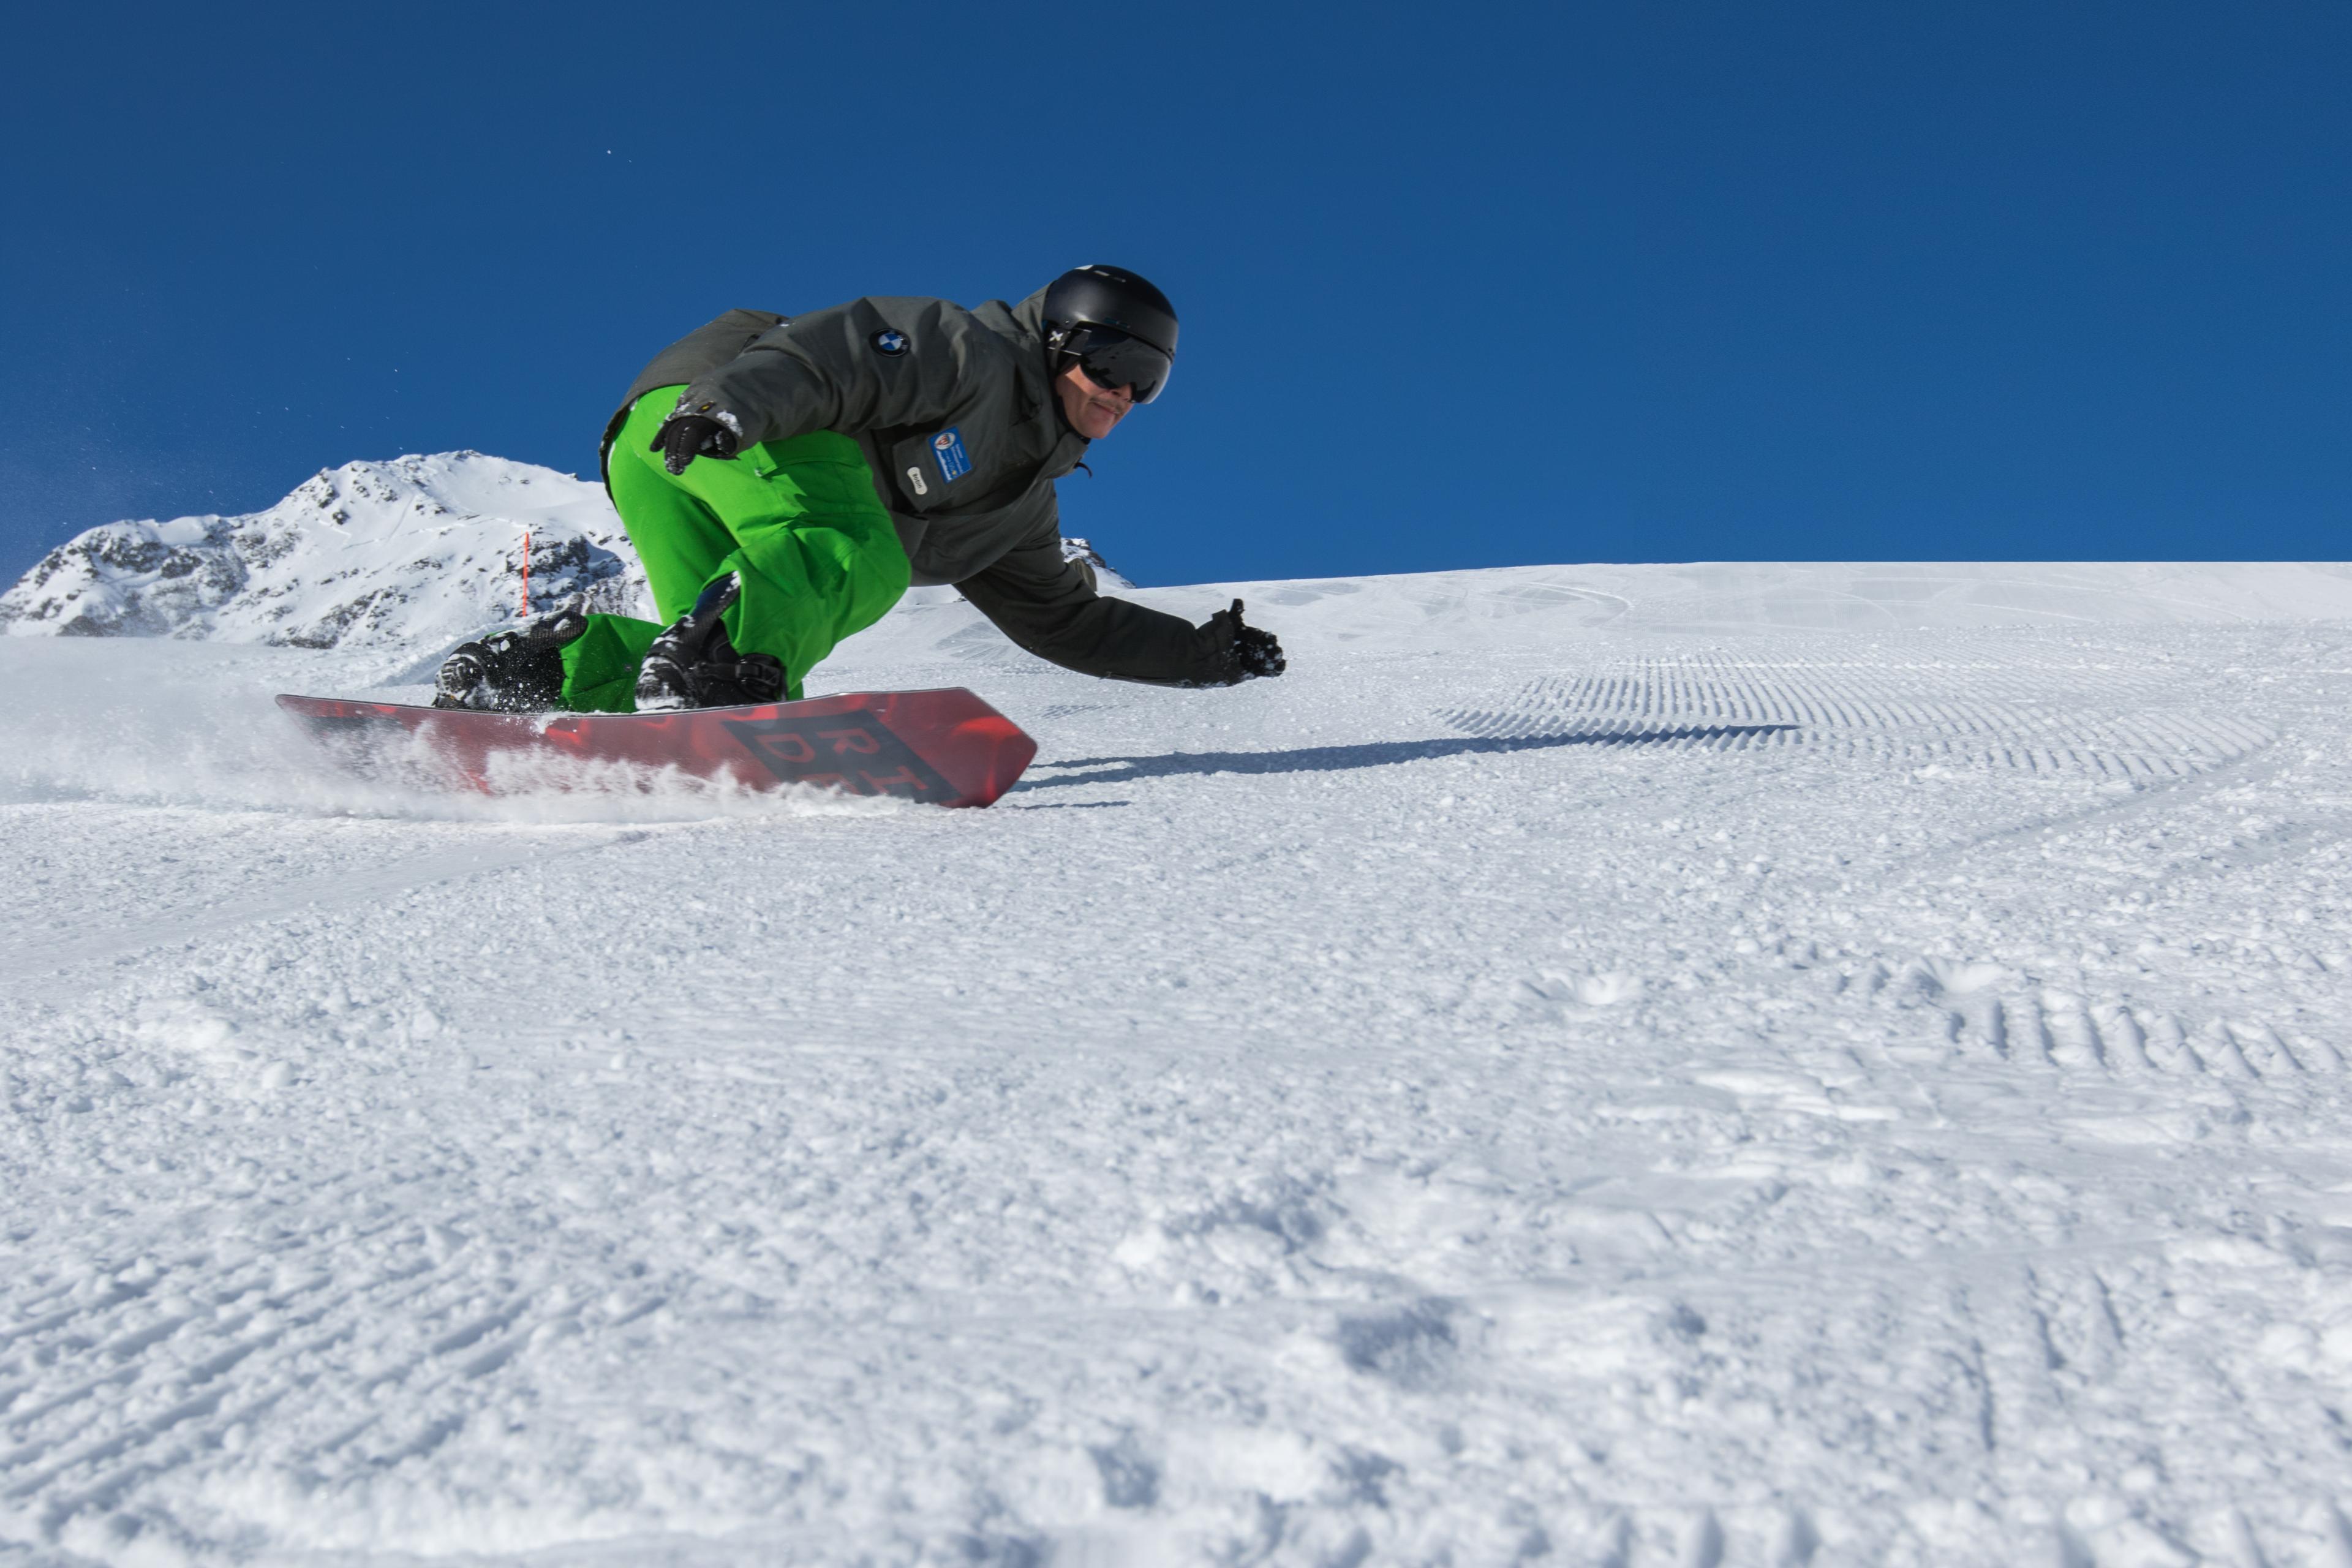 Snowboard Lessons for Kids - Intermediate